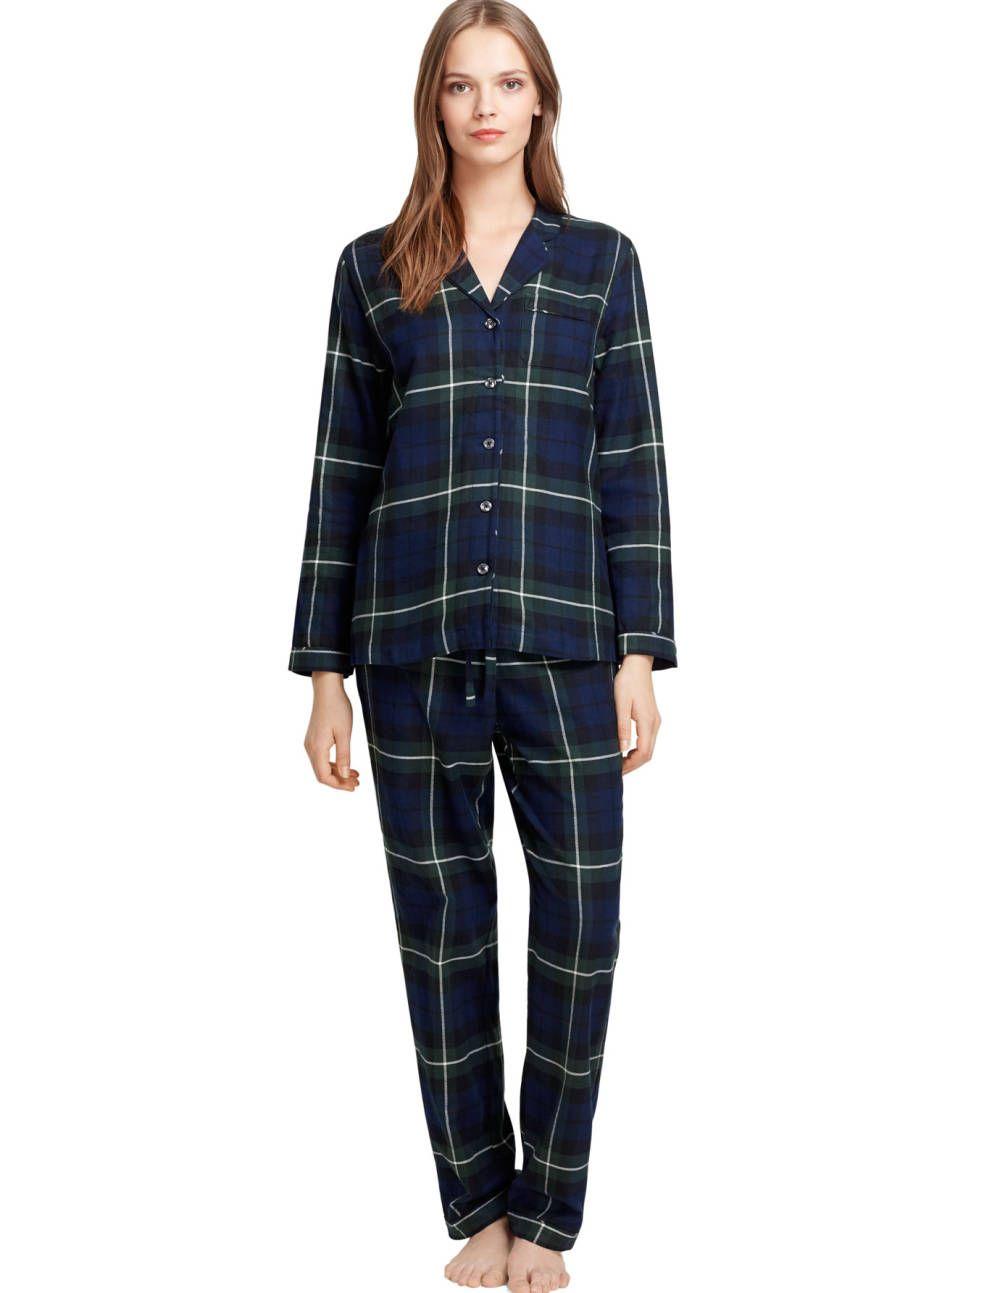 8ddc49c0a9 Brooks Brothers black watch plaid flannel pajamas.